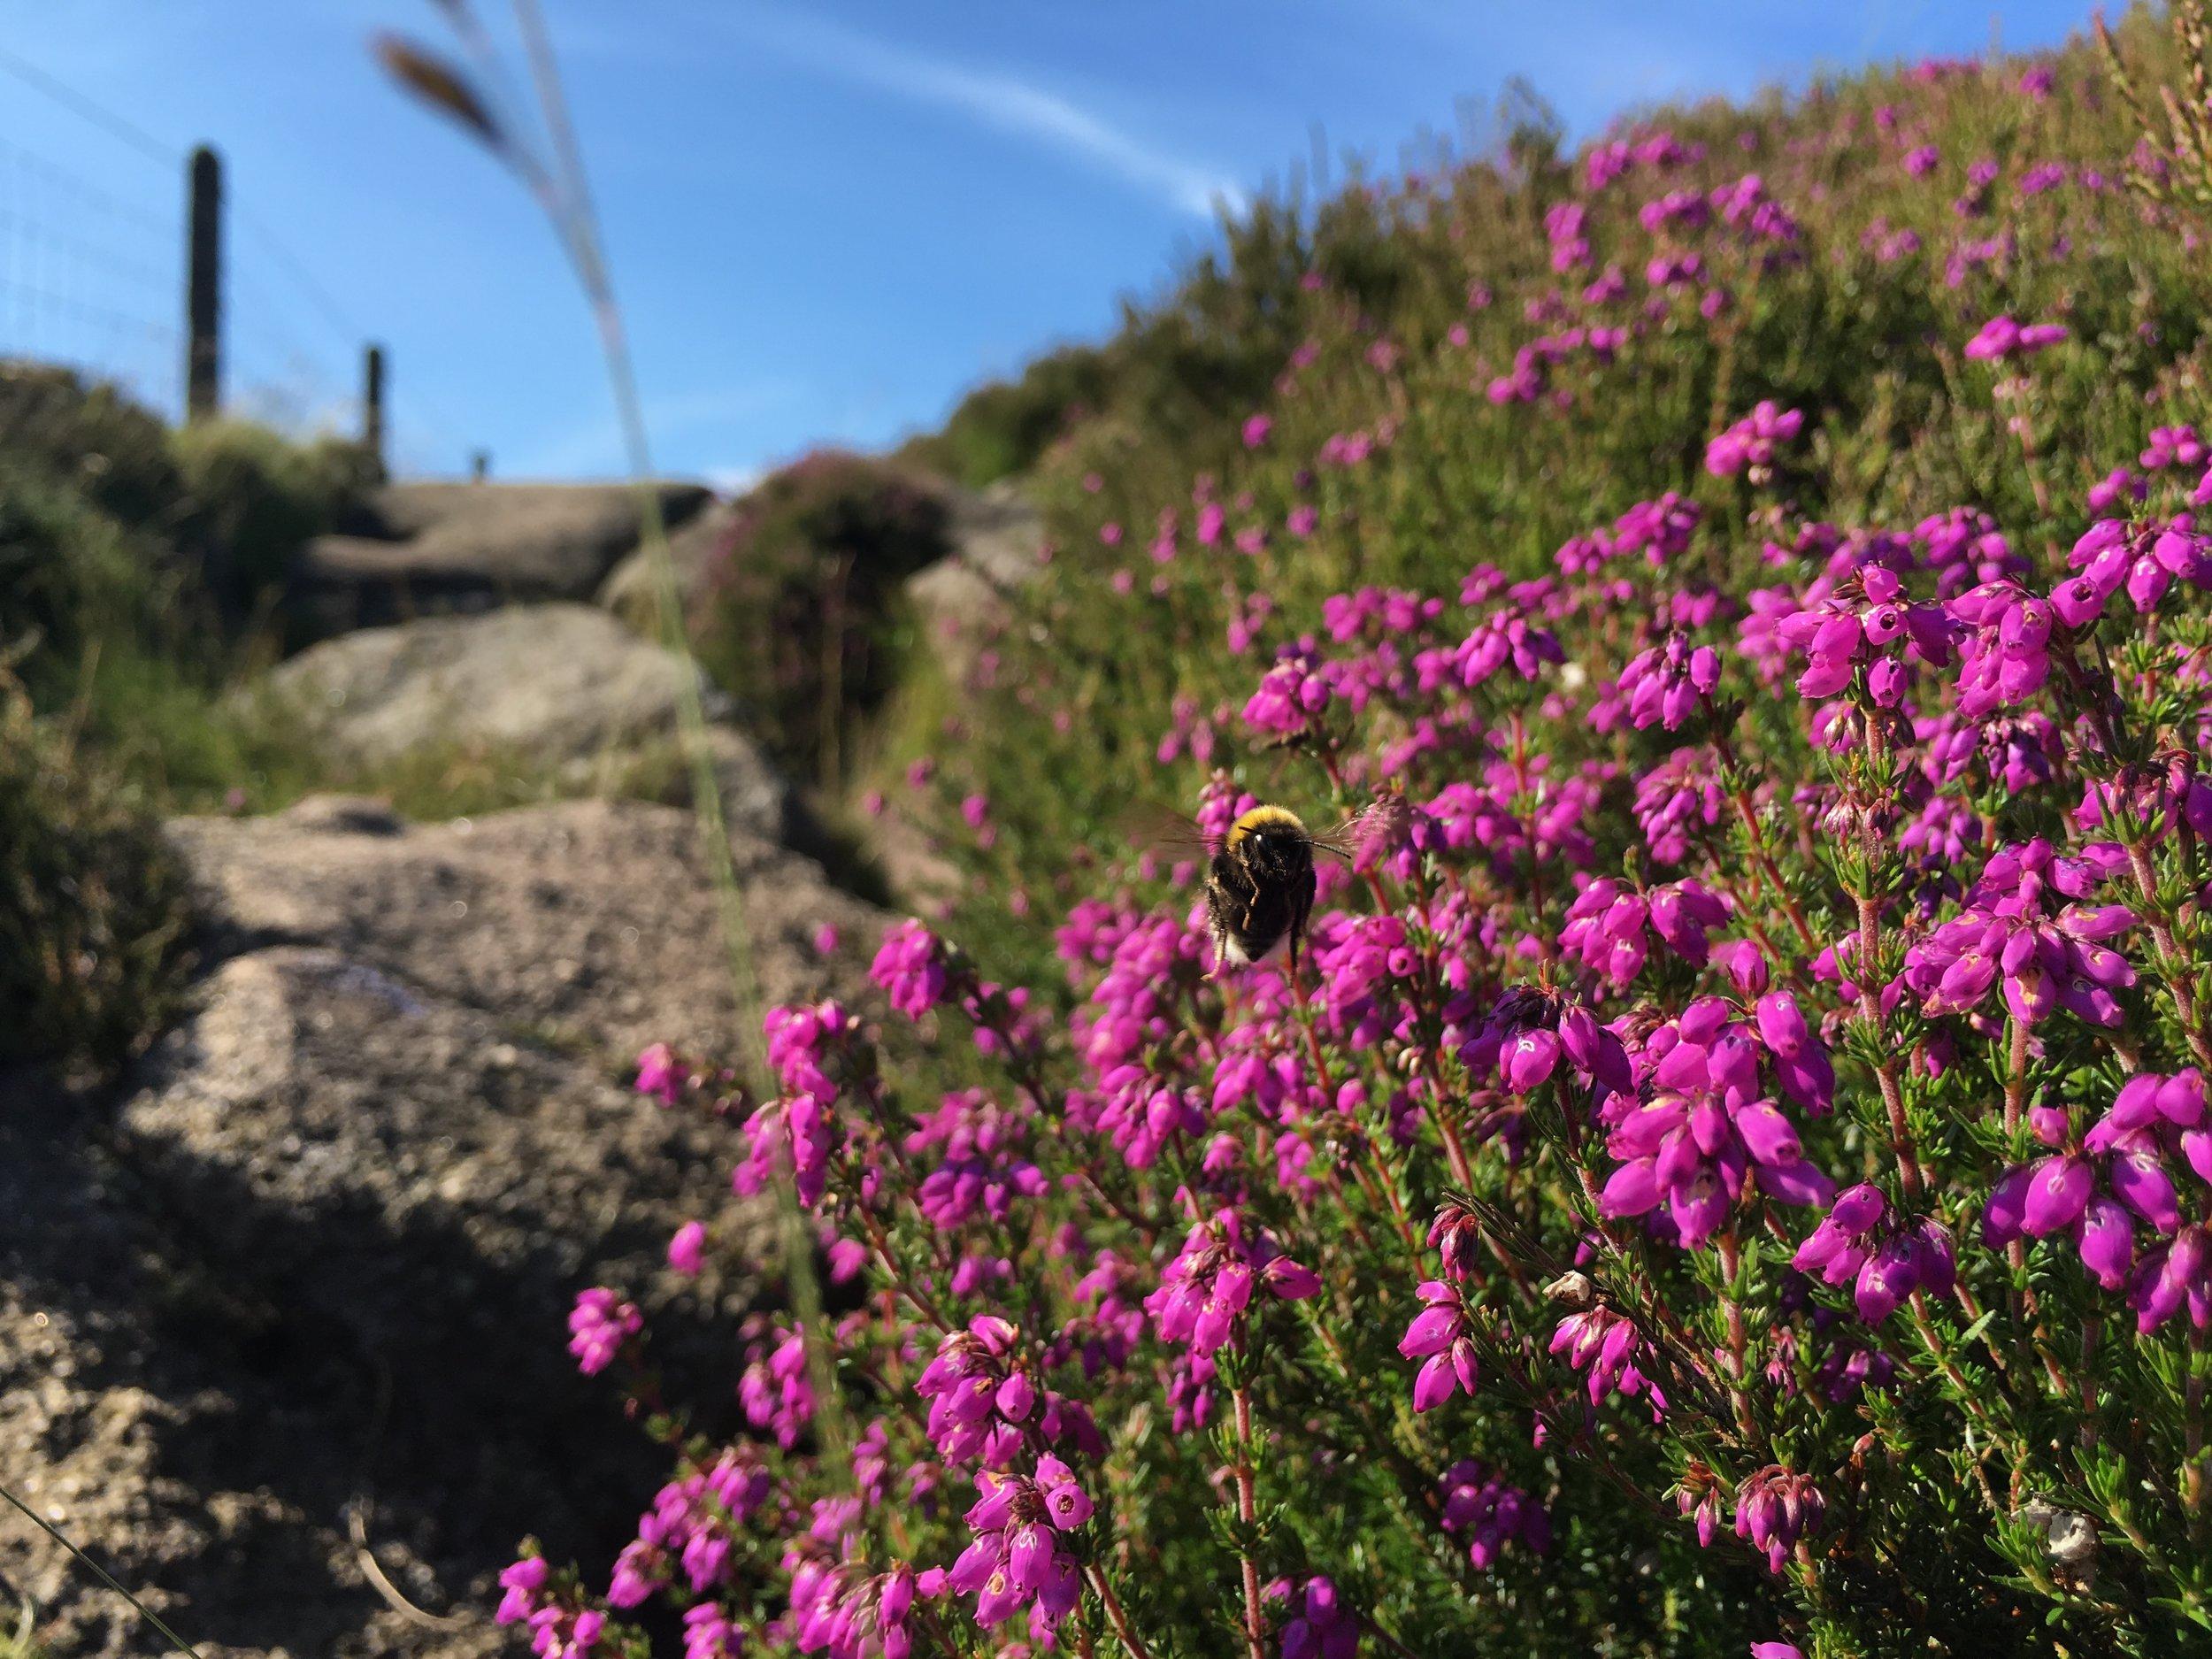 wildflowers growing along a trackway